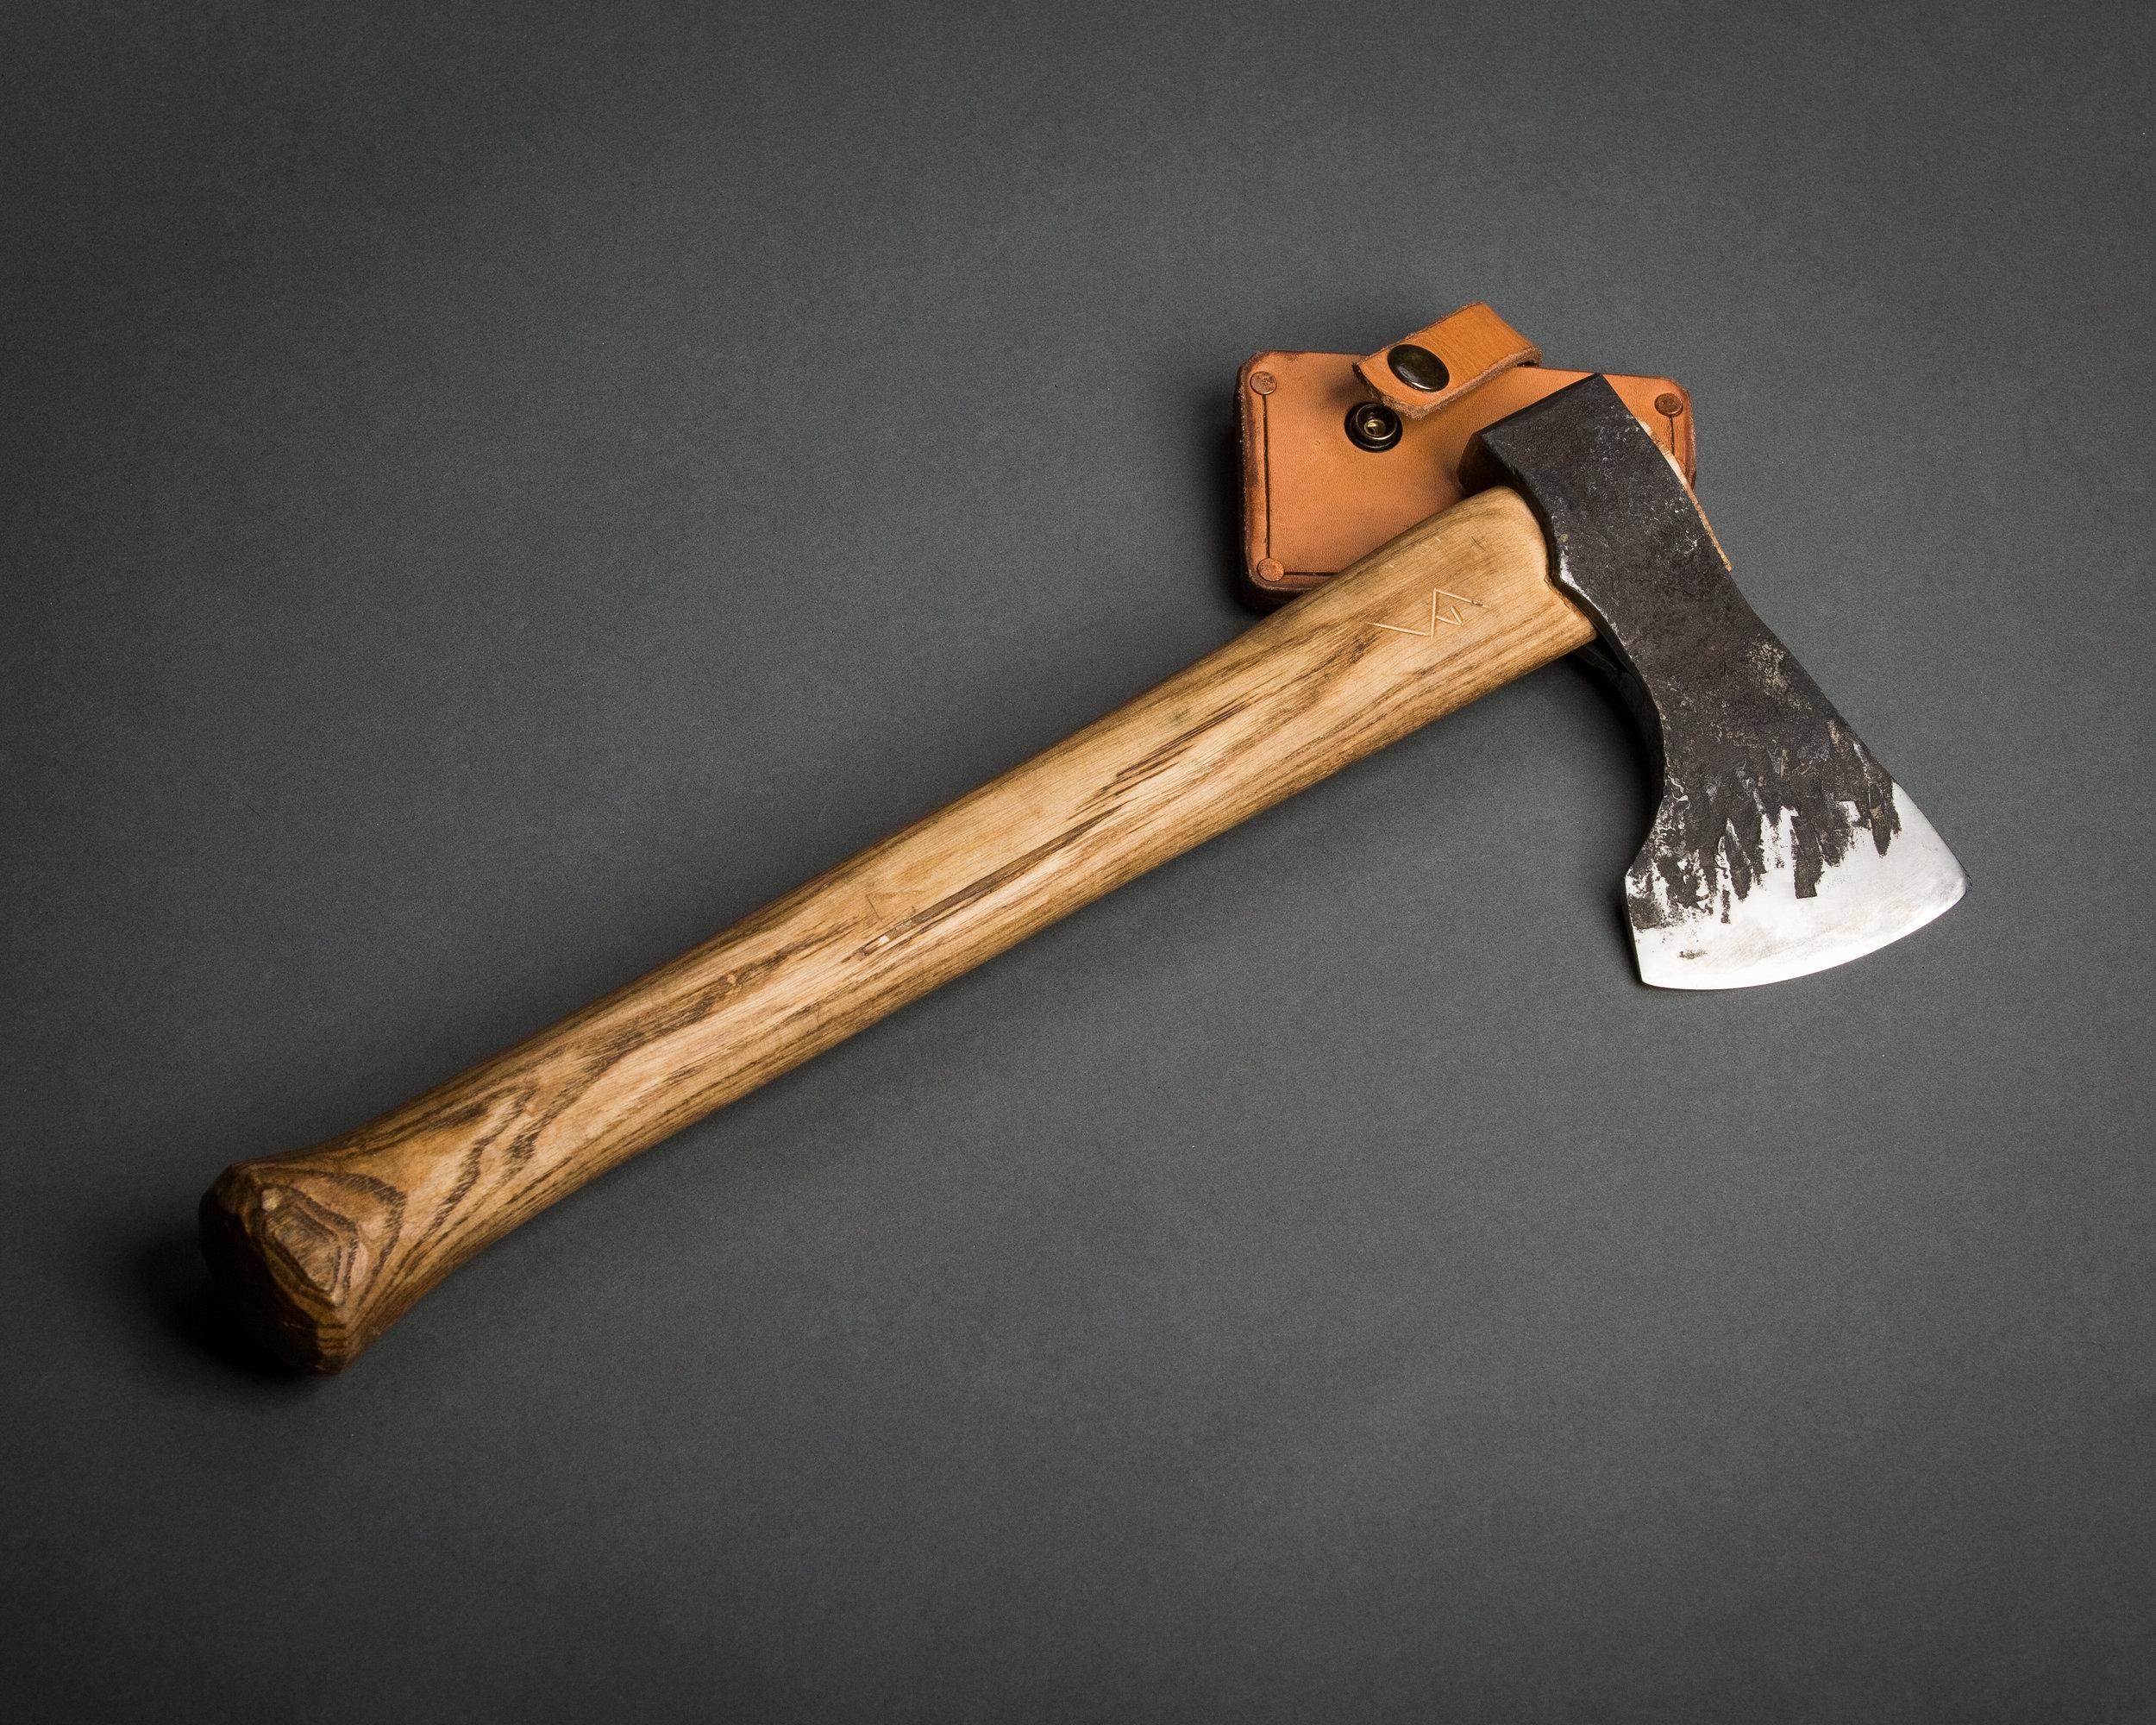 Carving Hatchet